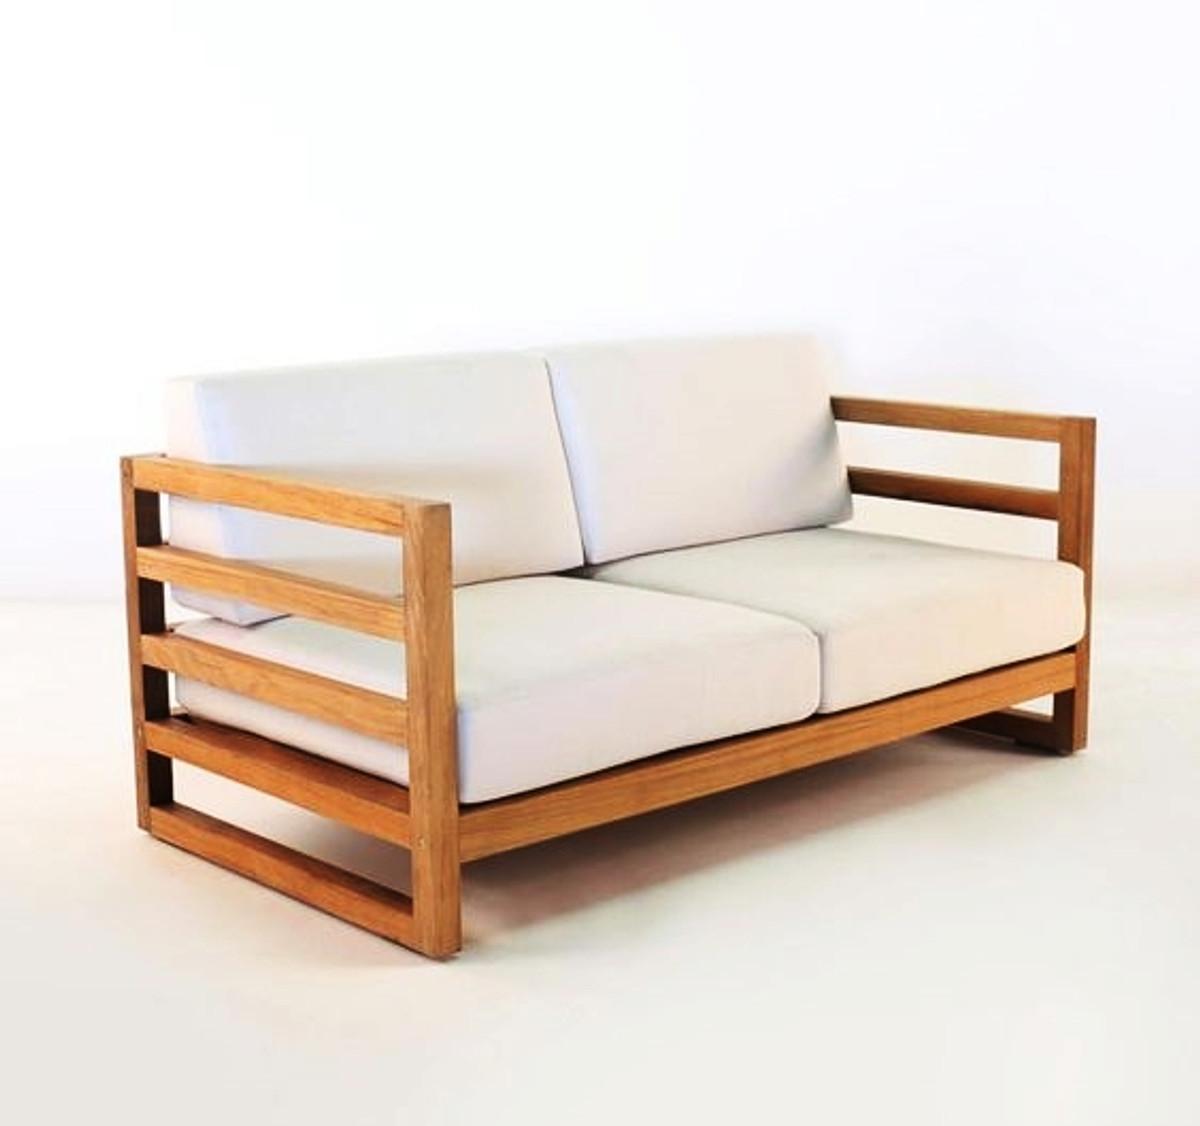 casa padrino garten 2 er sofa rustikal miami weiss creme braun 140 x 40 x h70 cm eiche. Black Bedroom Furniture Sets. Home Design Ideas